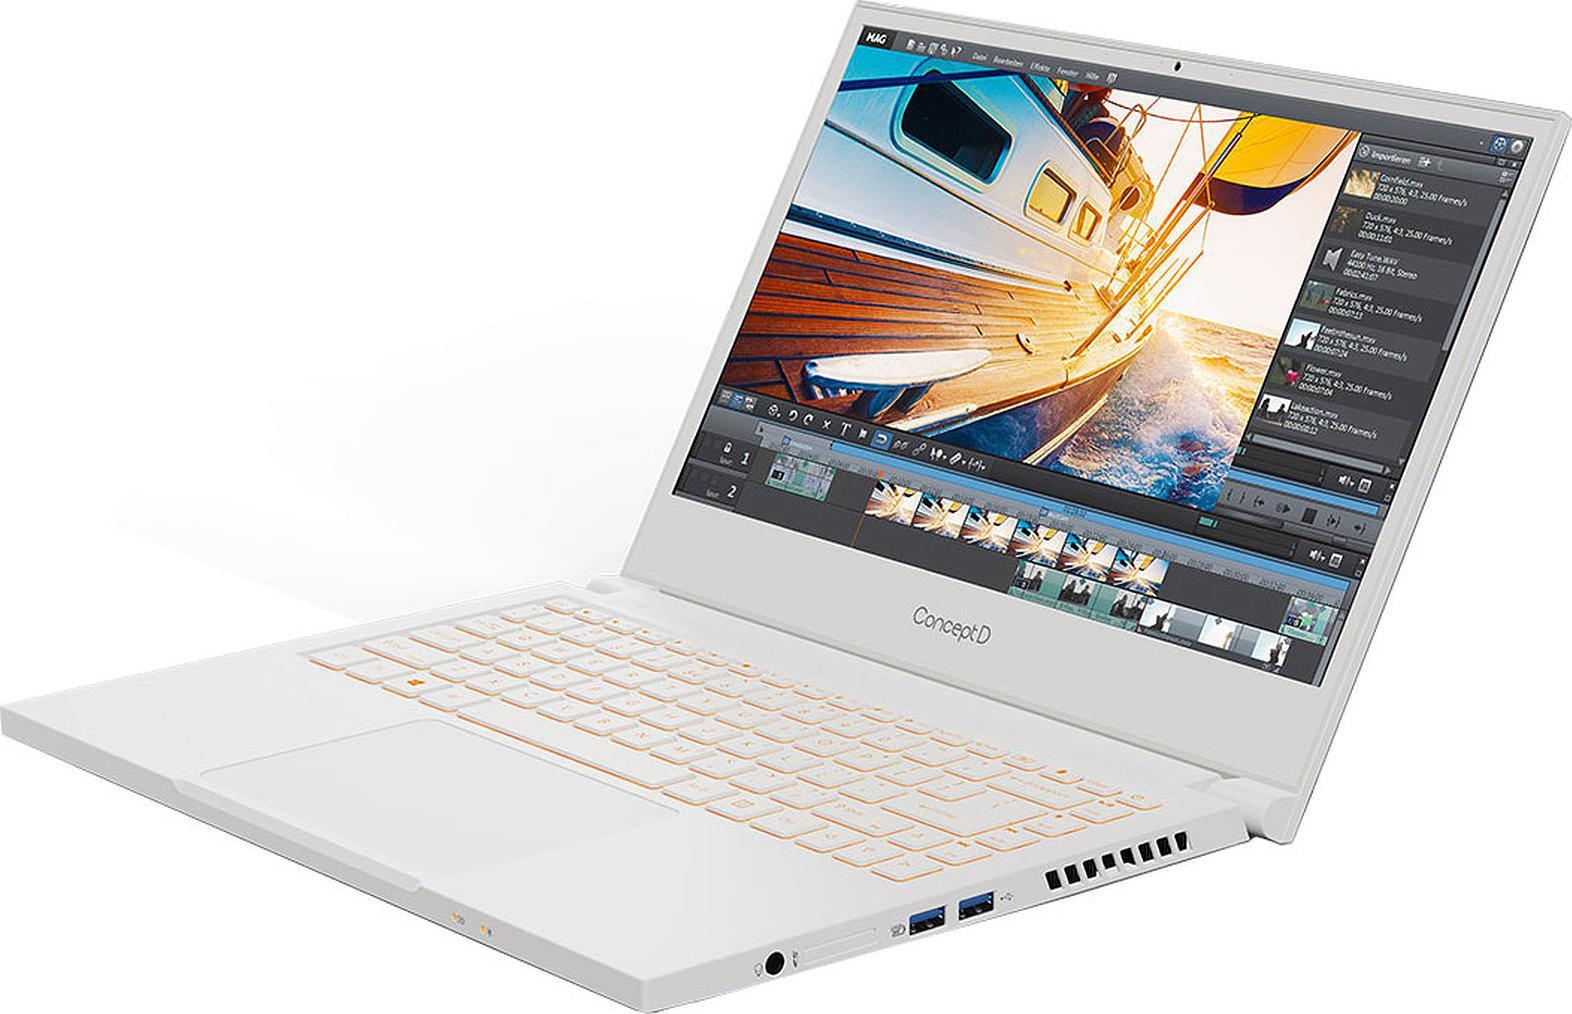 Acer ConceptD CN314-72P-7526